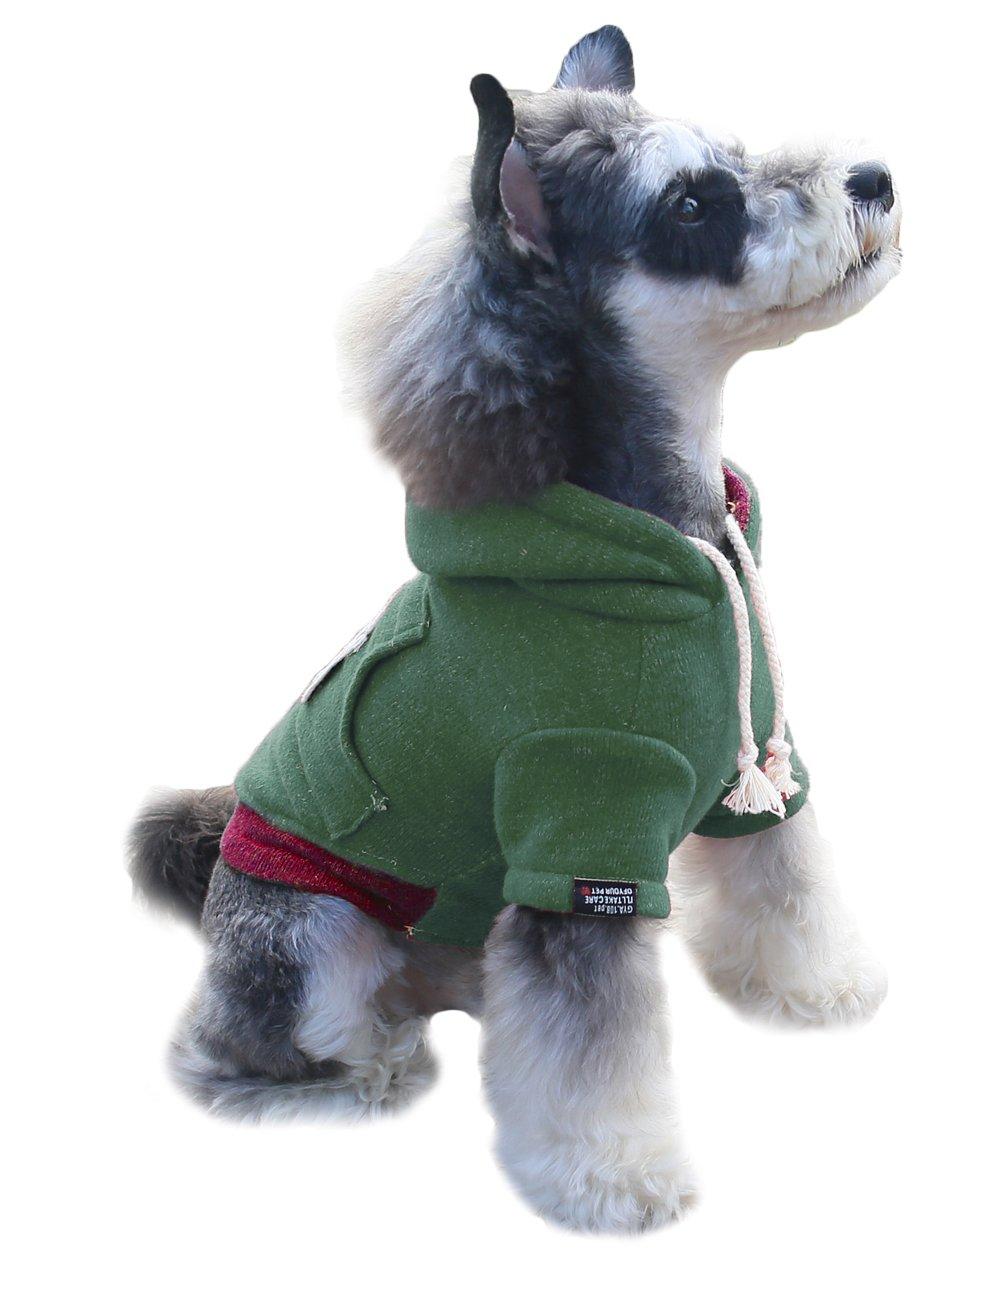 Gyapet Dog Sweater Hoodie For Small dogs Shirt Winter Warm Cotton Cloth Pet Puppy miniature schnauzer Green L